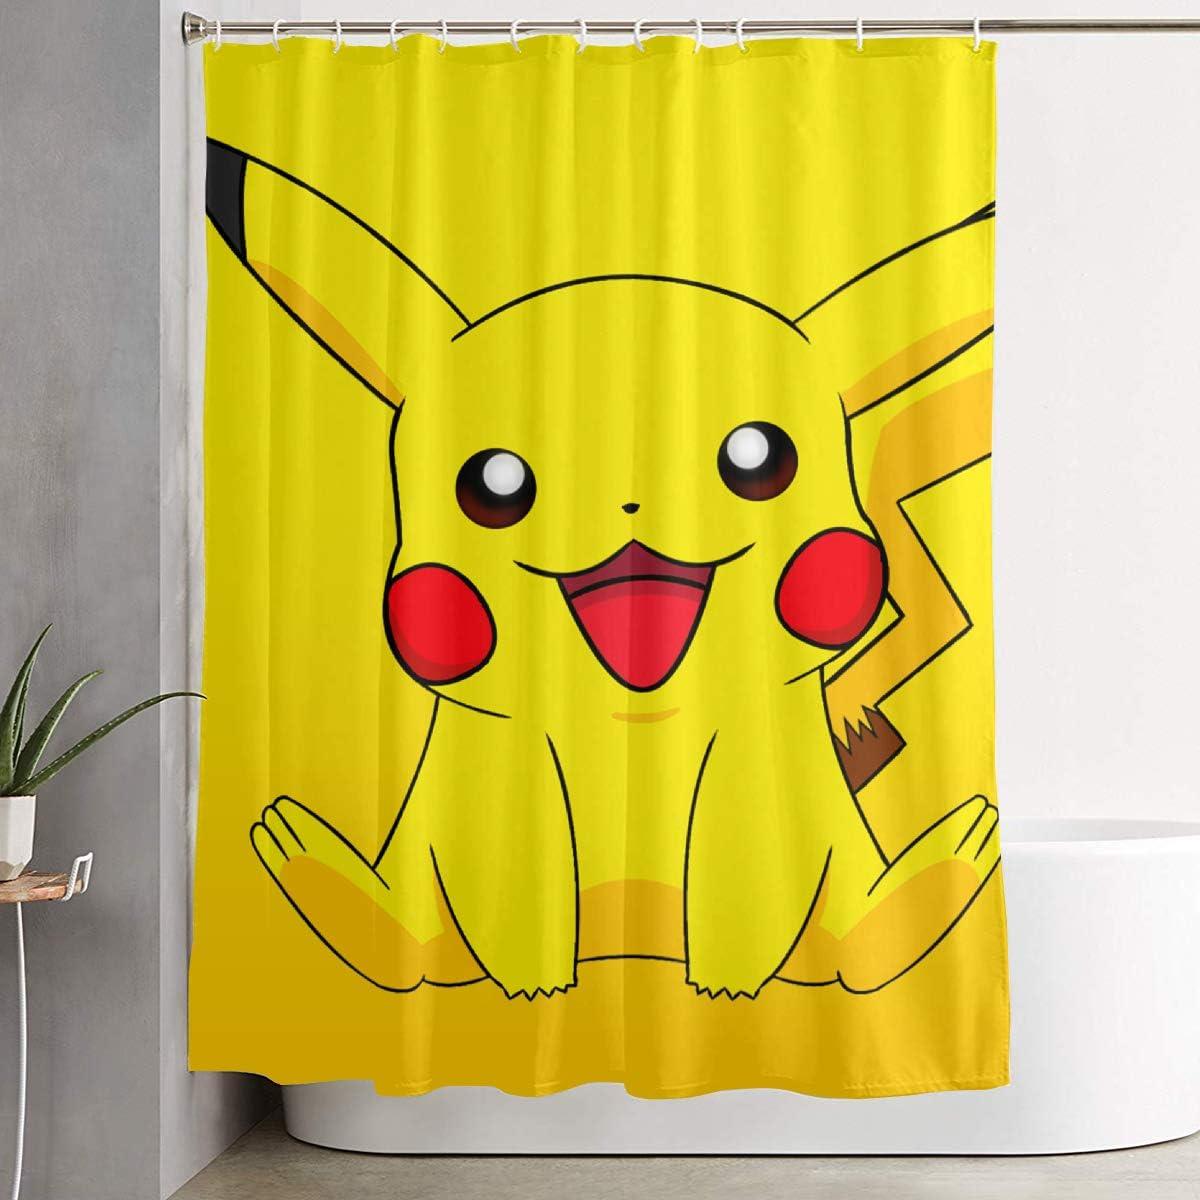 Pokemon I Choose You Kids Shower Fabric Curtain Bathroom Home Decoration NEW